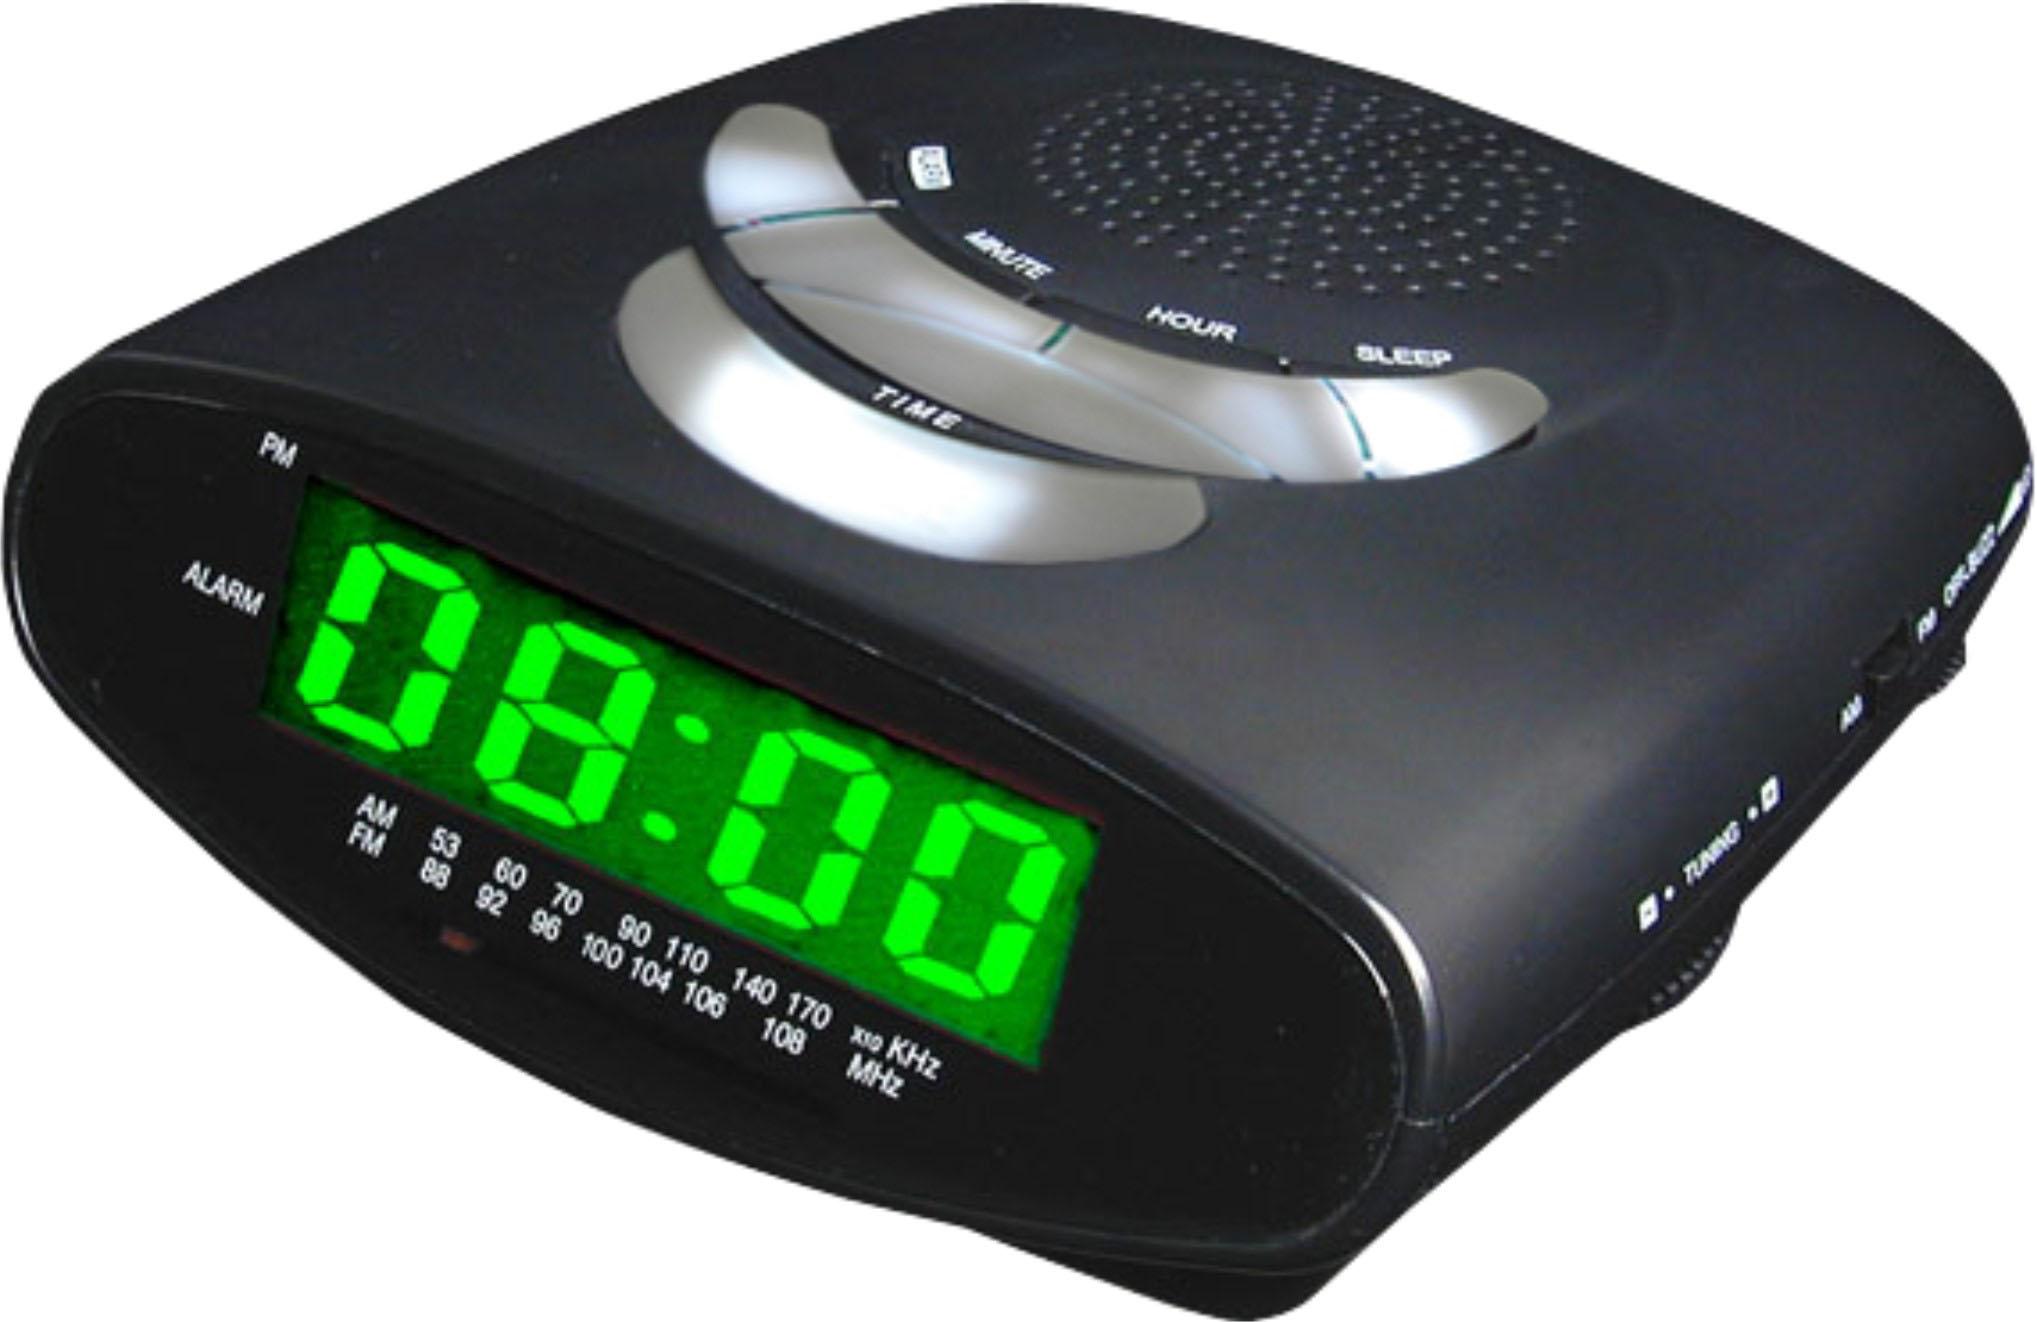 Alarm Clock Radio with MP3 Connectivity